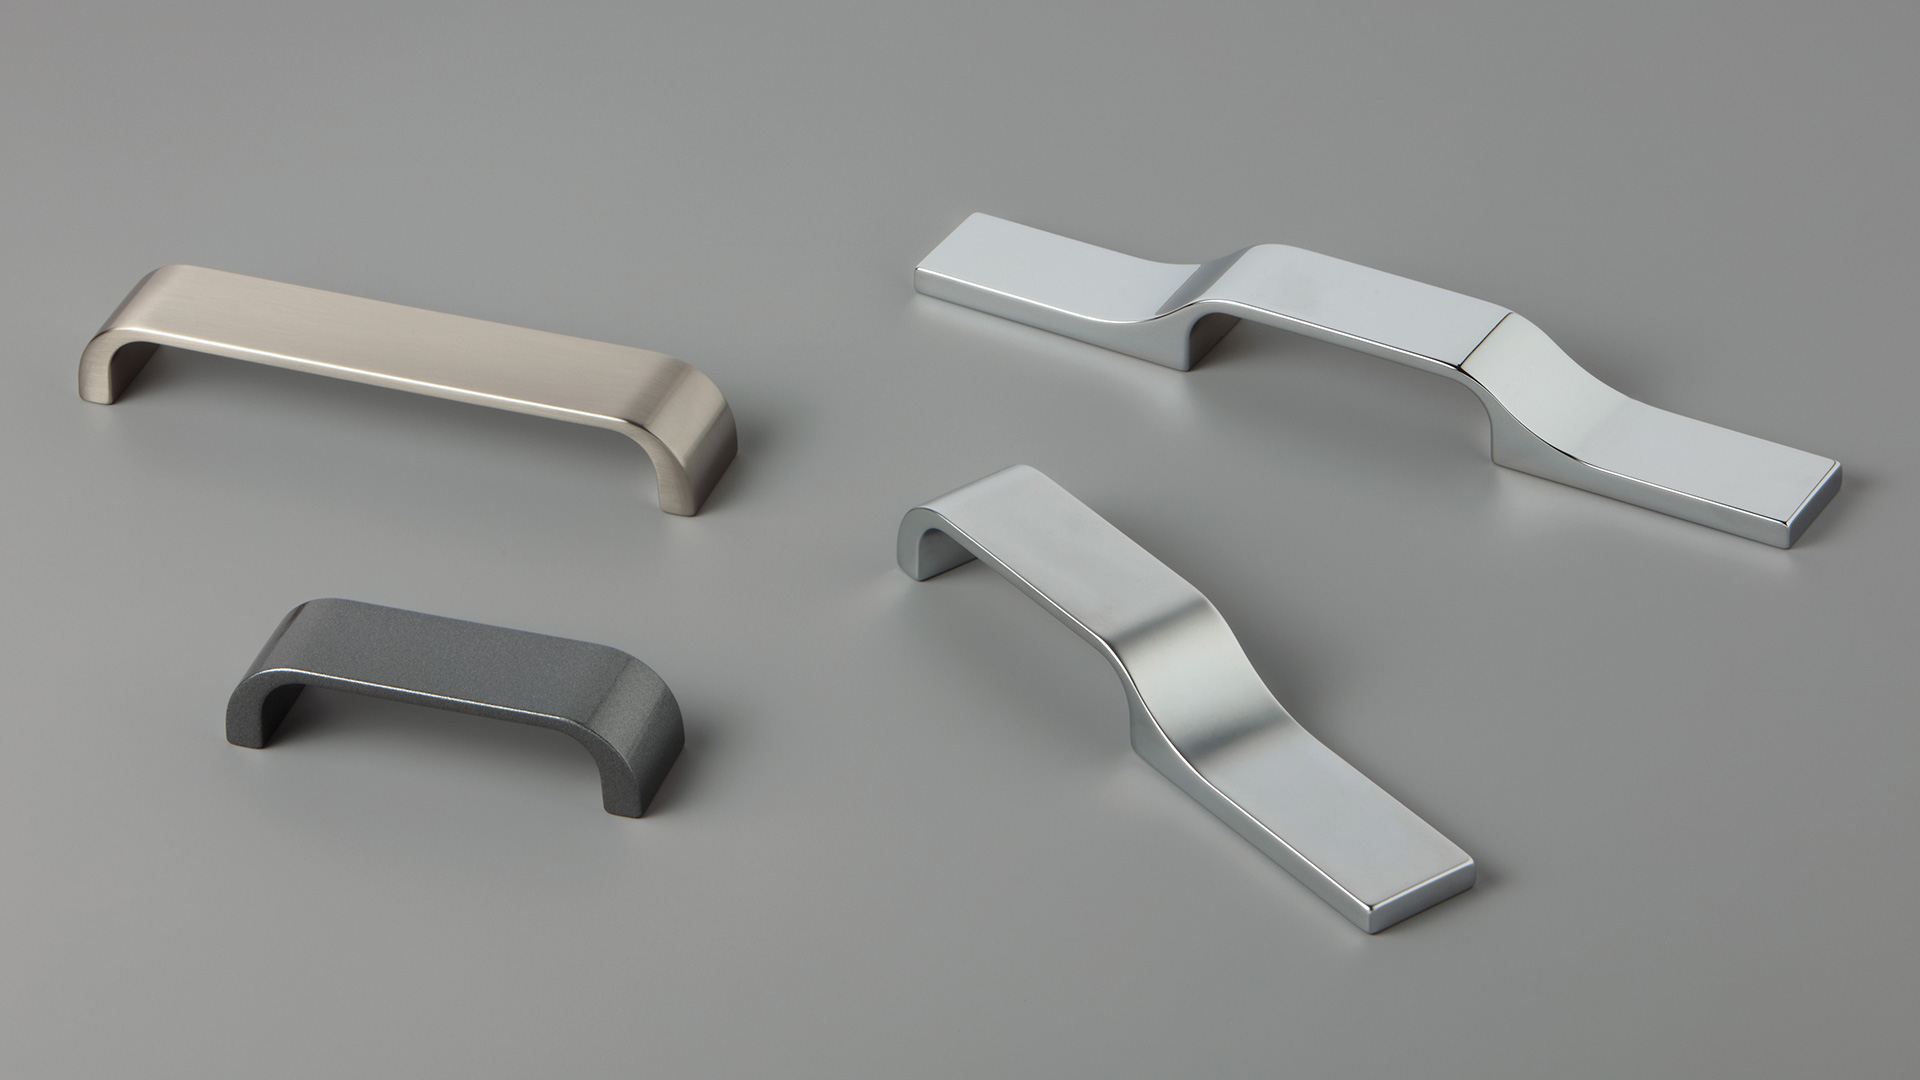 024_CITTERIOGIULIO_contemporary_handles.jpg